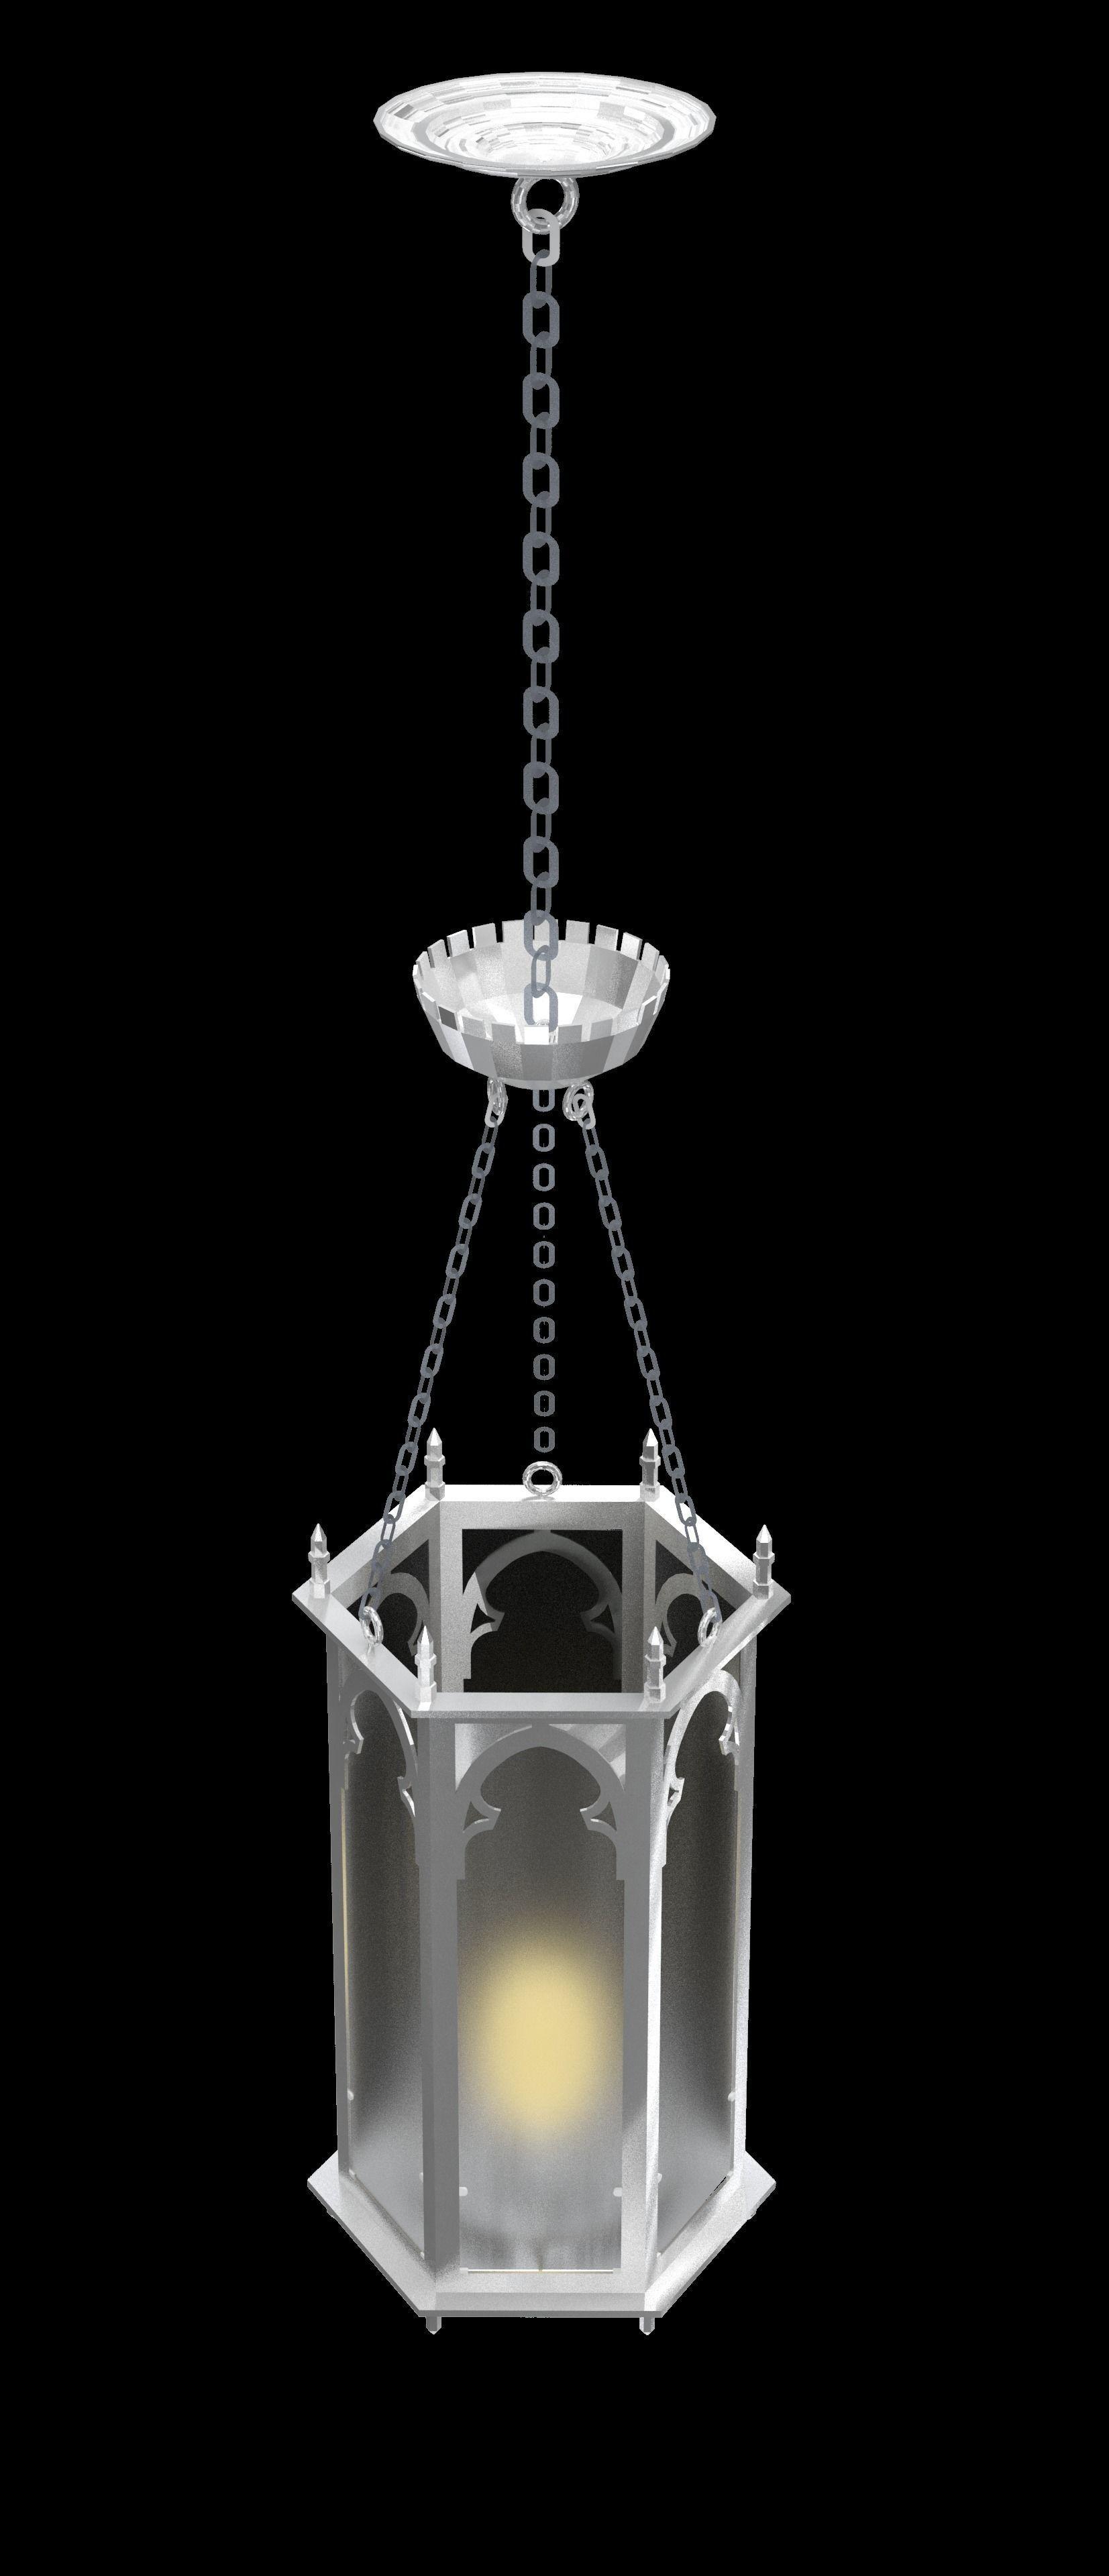 Gothic Ceiling Hung Light Fixture Decorative 3d Model Obj 3ds 3dm Dwg Skp 4